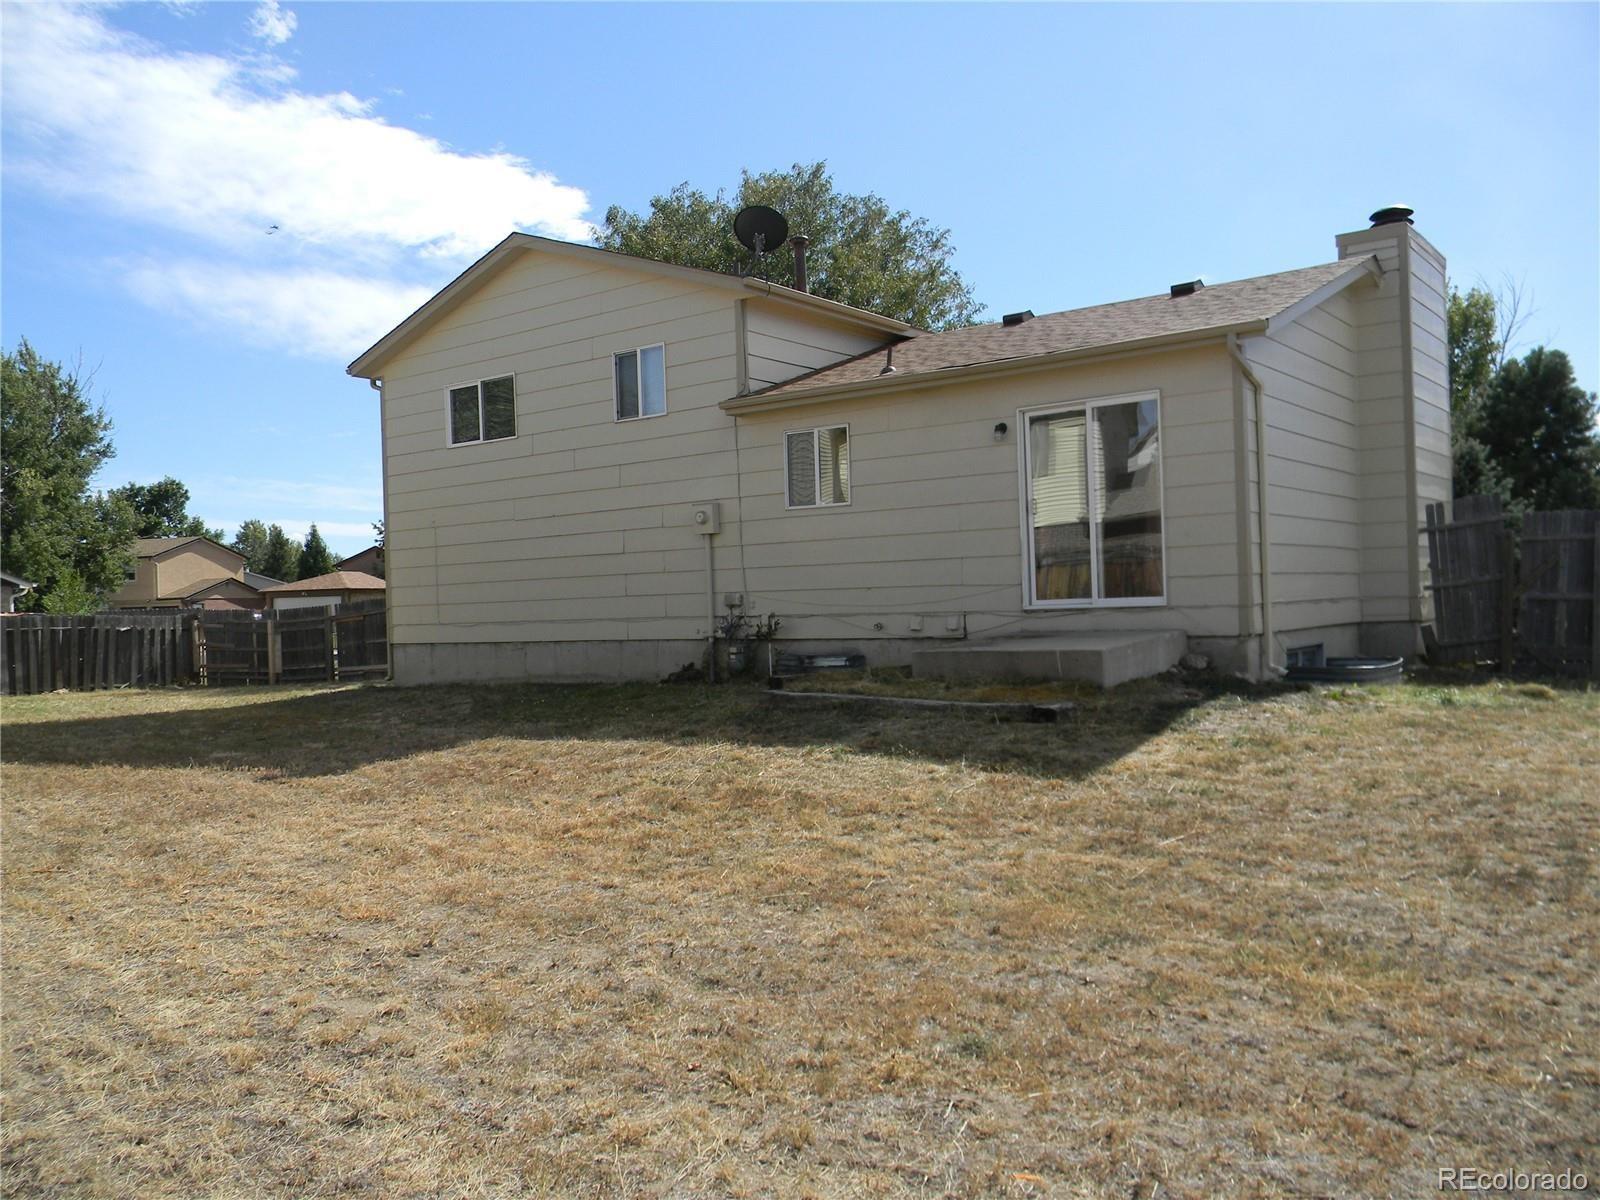 MLS# 5946356 - 23 - 4920 Ridenour Drive, Colorado Springs, CO 80916